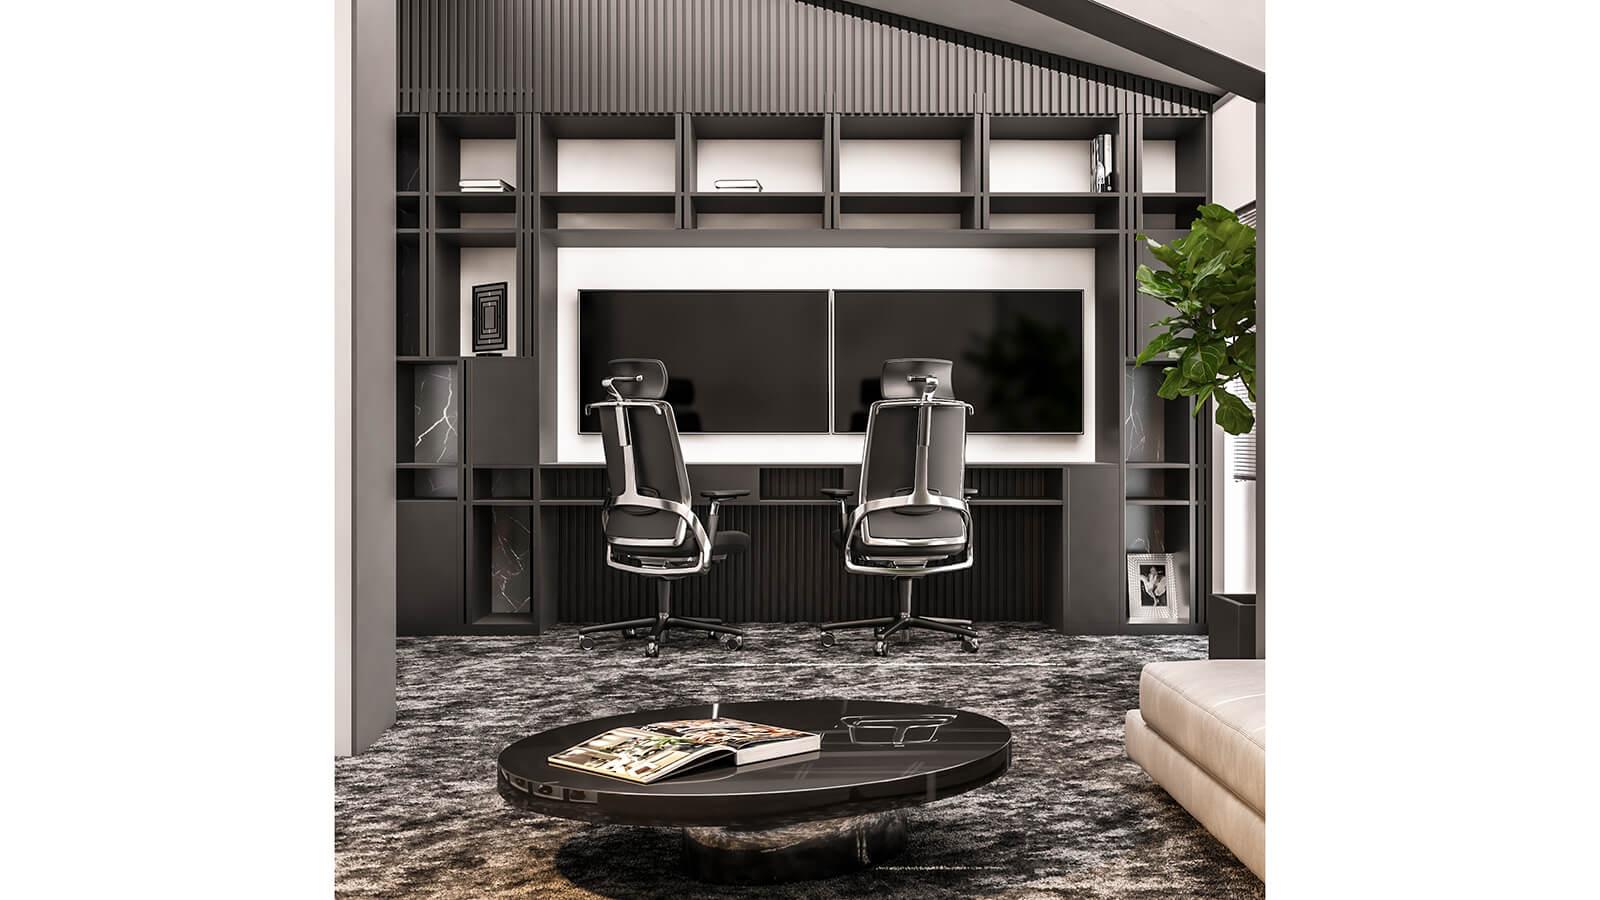 interioren-dizain-na-kashta-serena-esteta-interiori-kabinet (3)